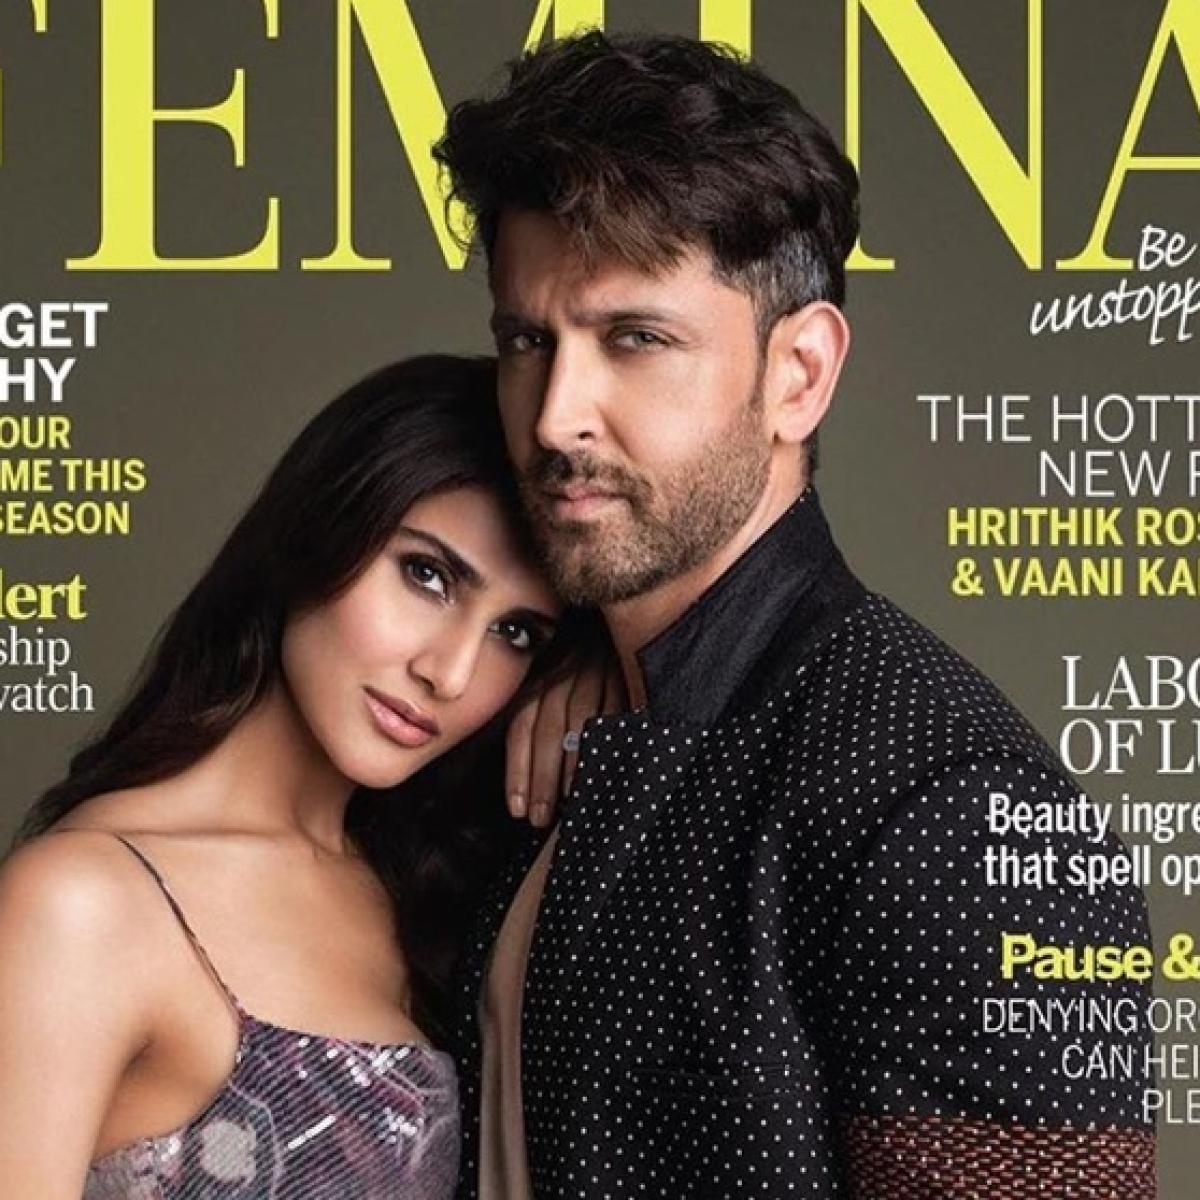 'War' duo Hrithik Roshan, Vaani Kapoor poses for latest magazine cover